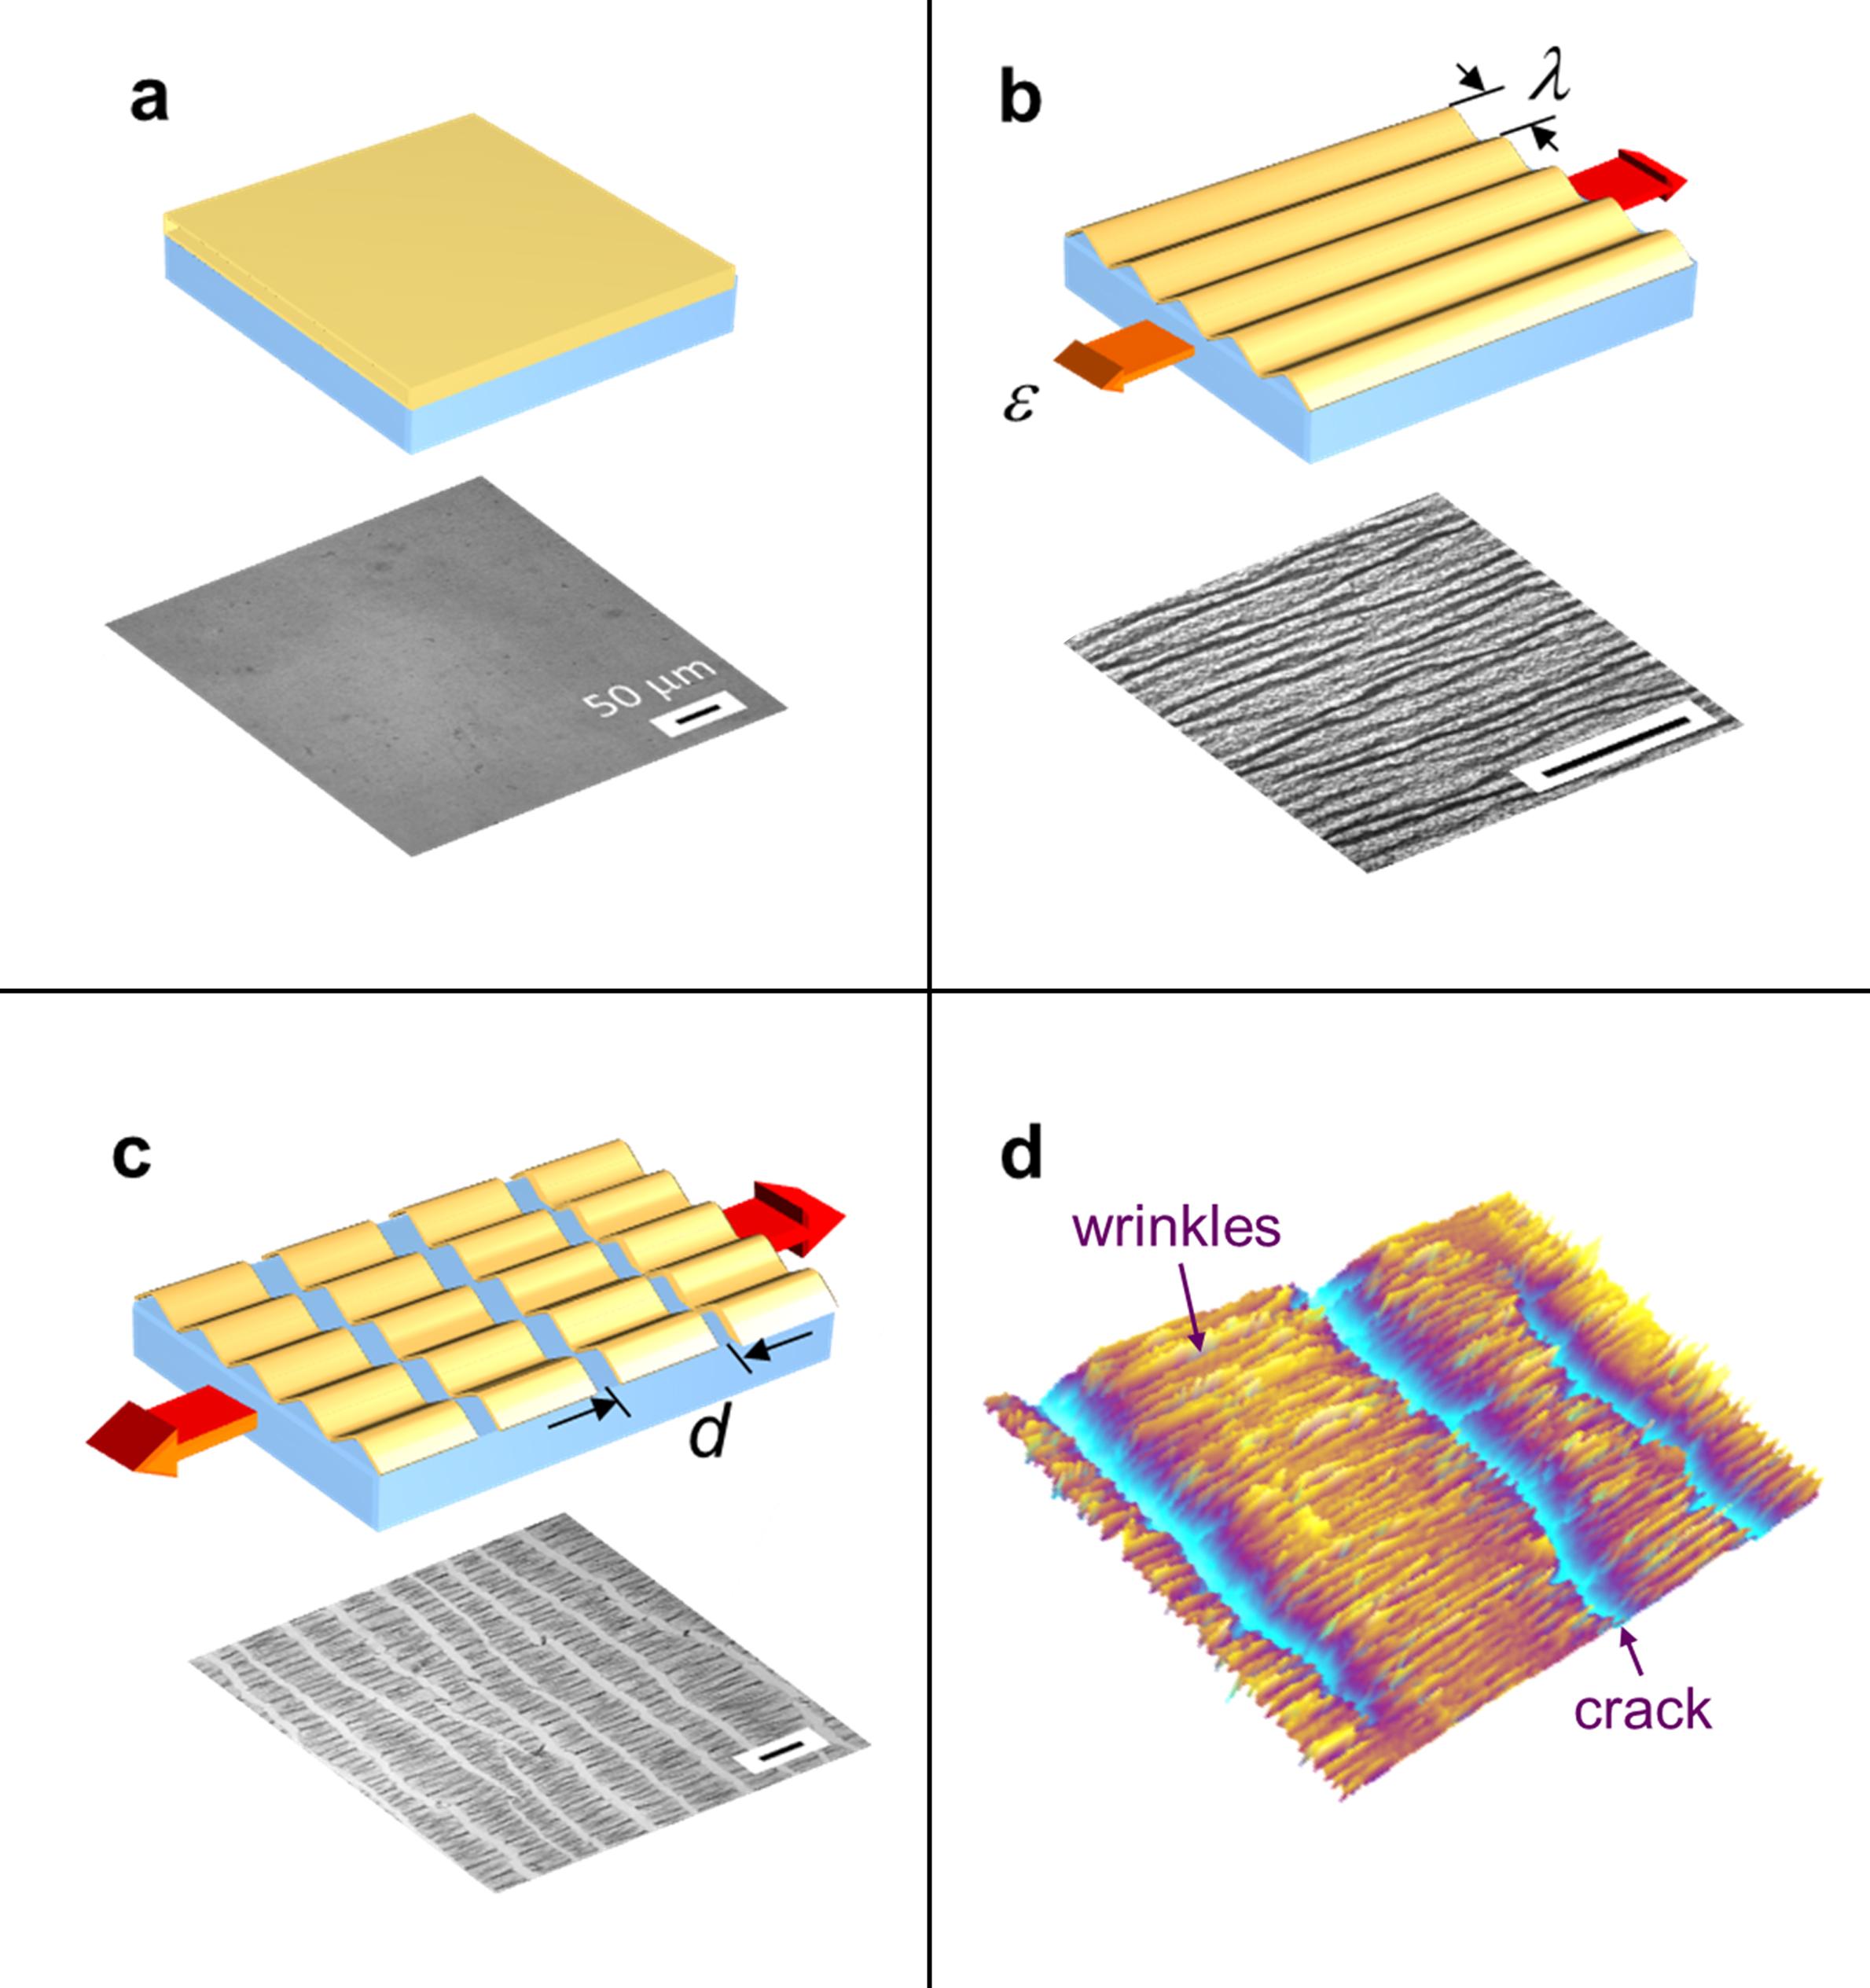 Nanomechanics: New Test Measures Key Properties Of Polymer